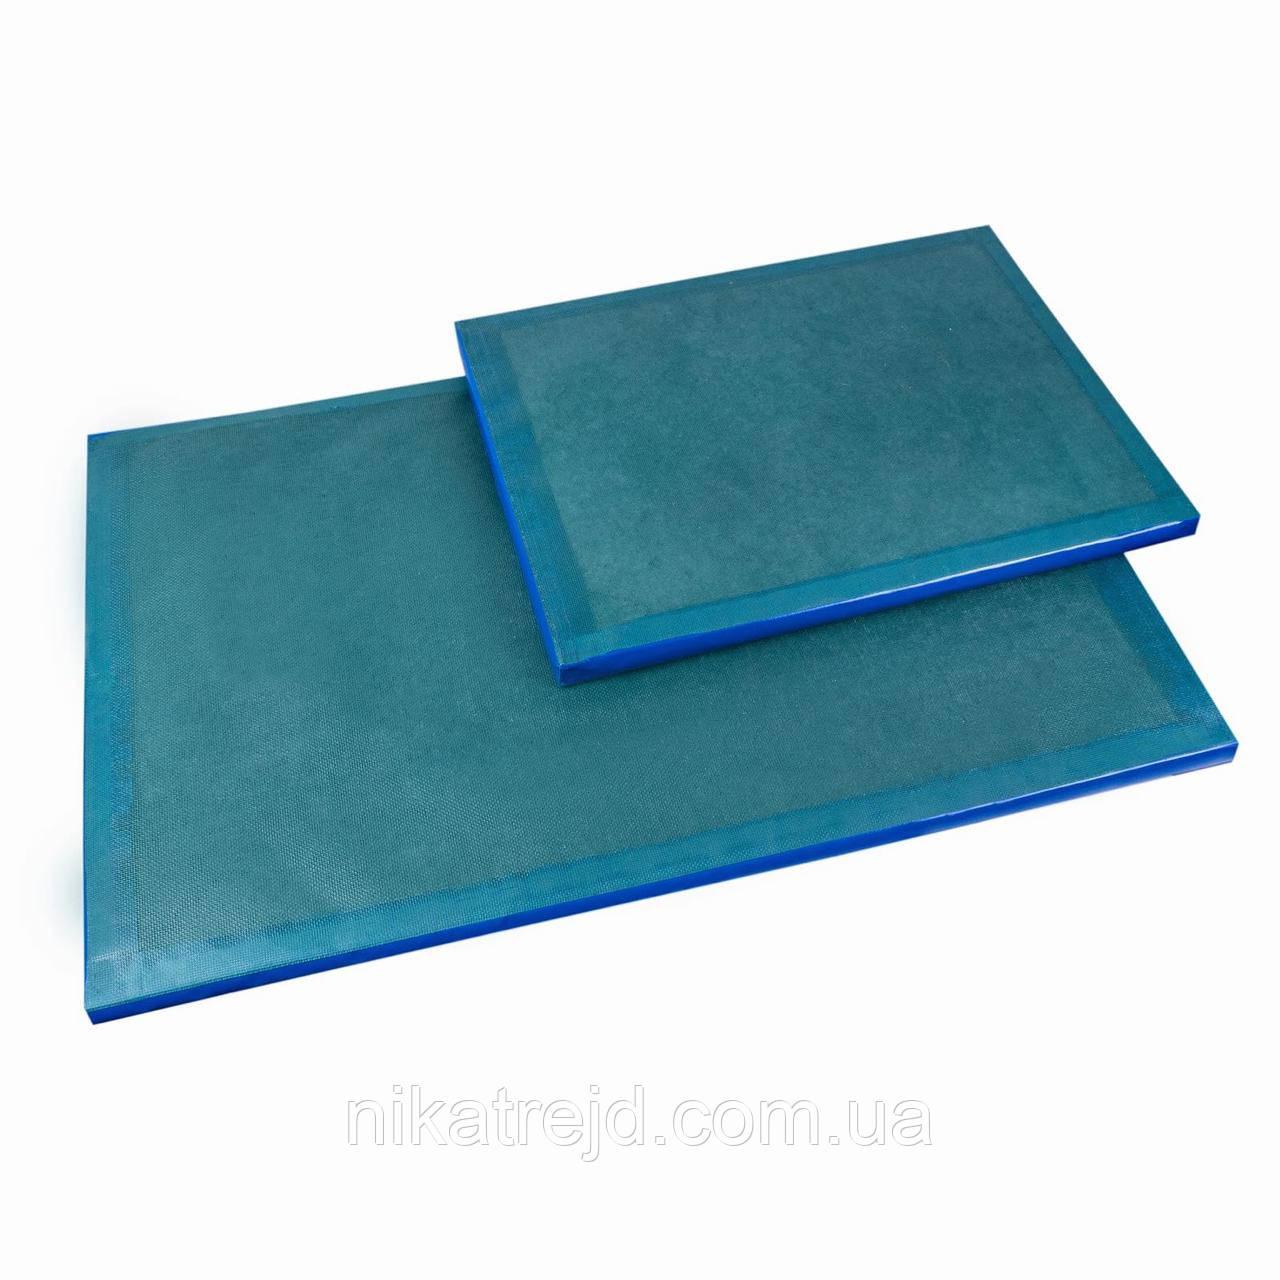 Медицинский дезинфицирующий коврик 100х100х1,5 см